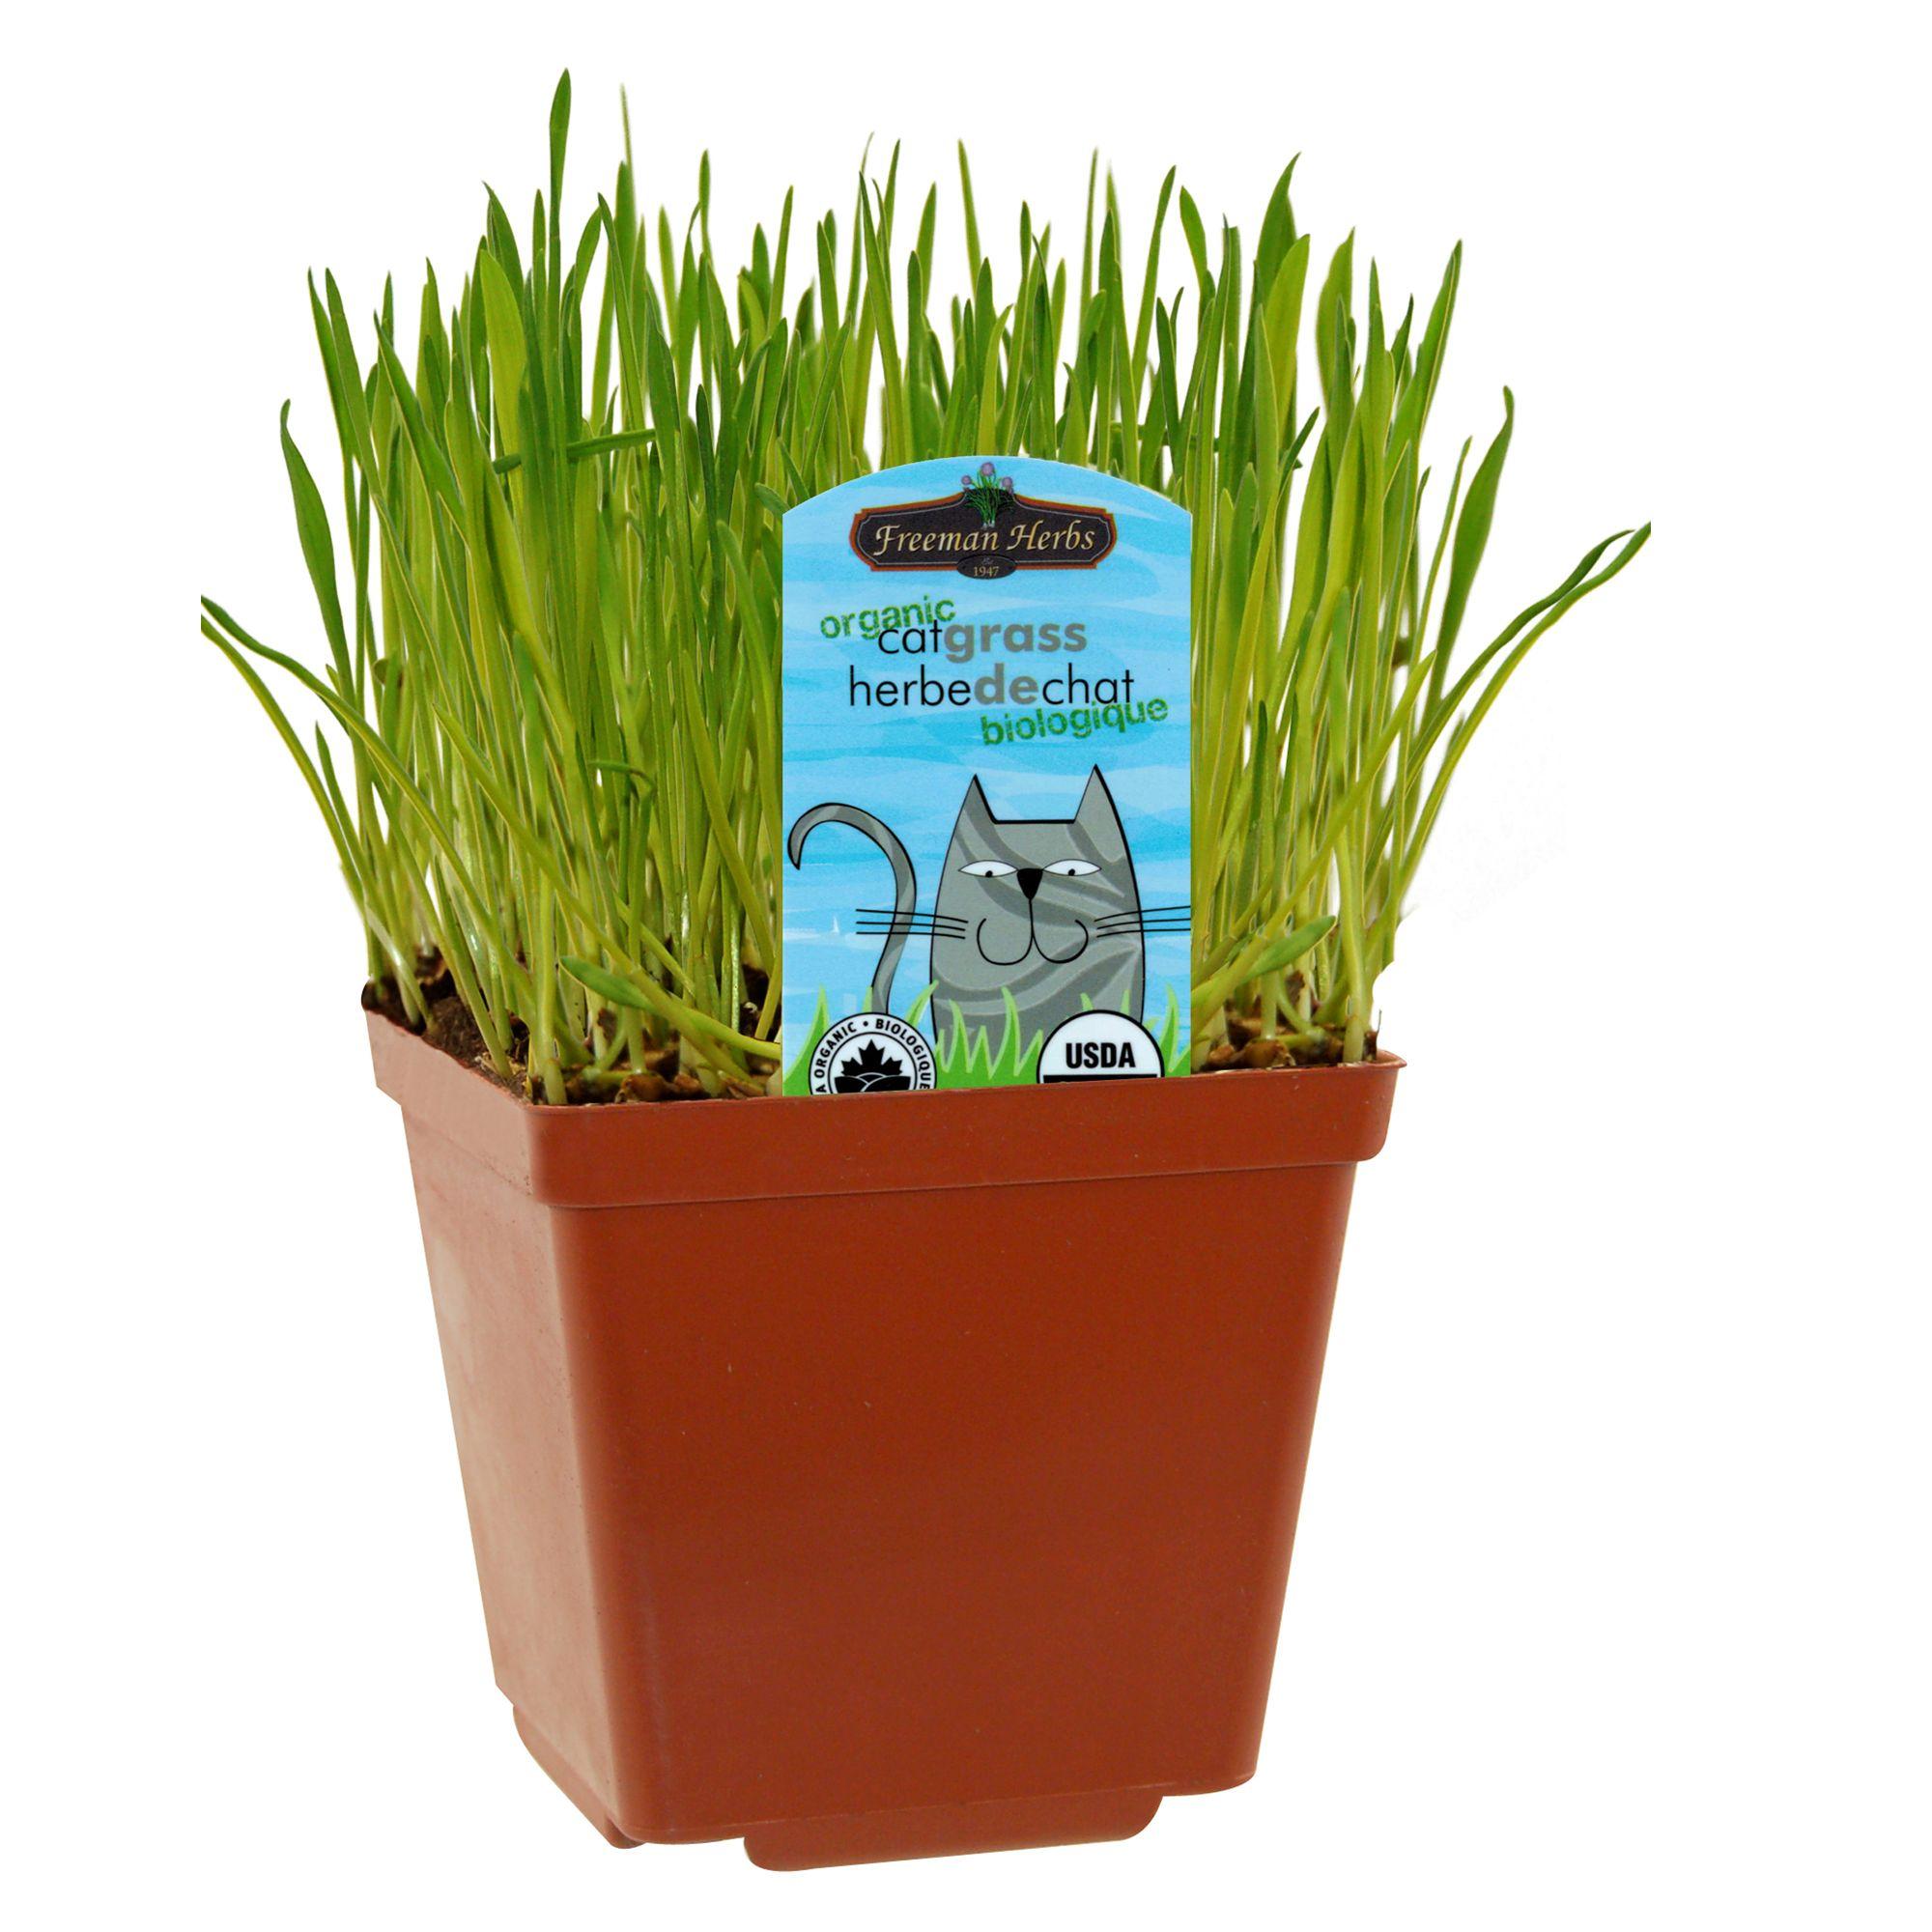 Catnip & Grass